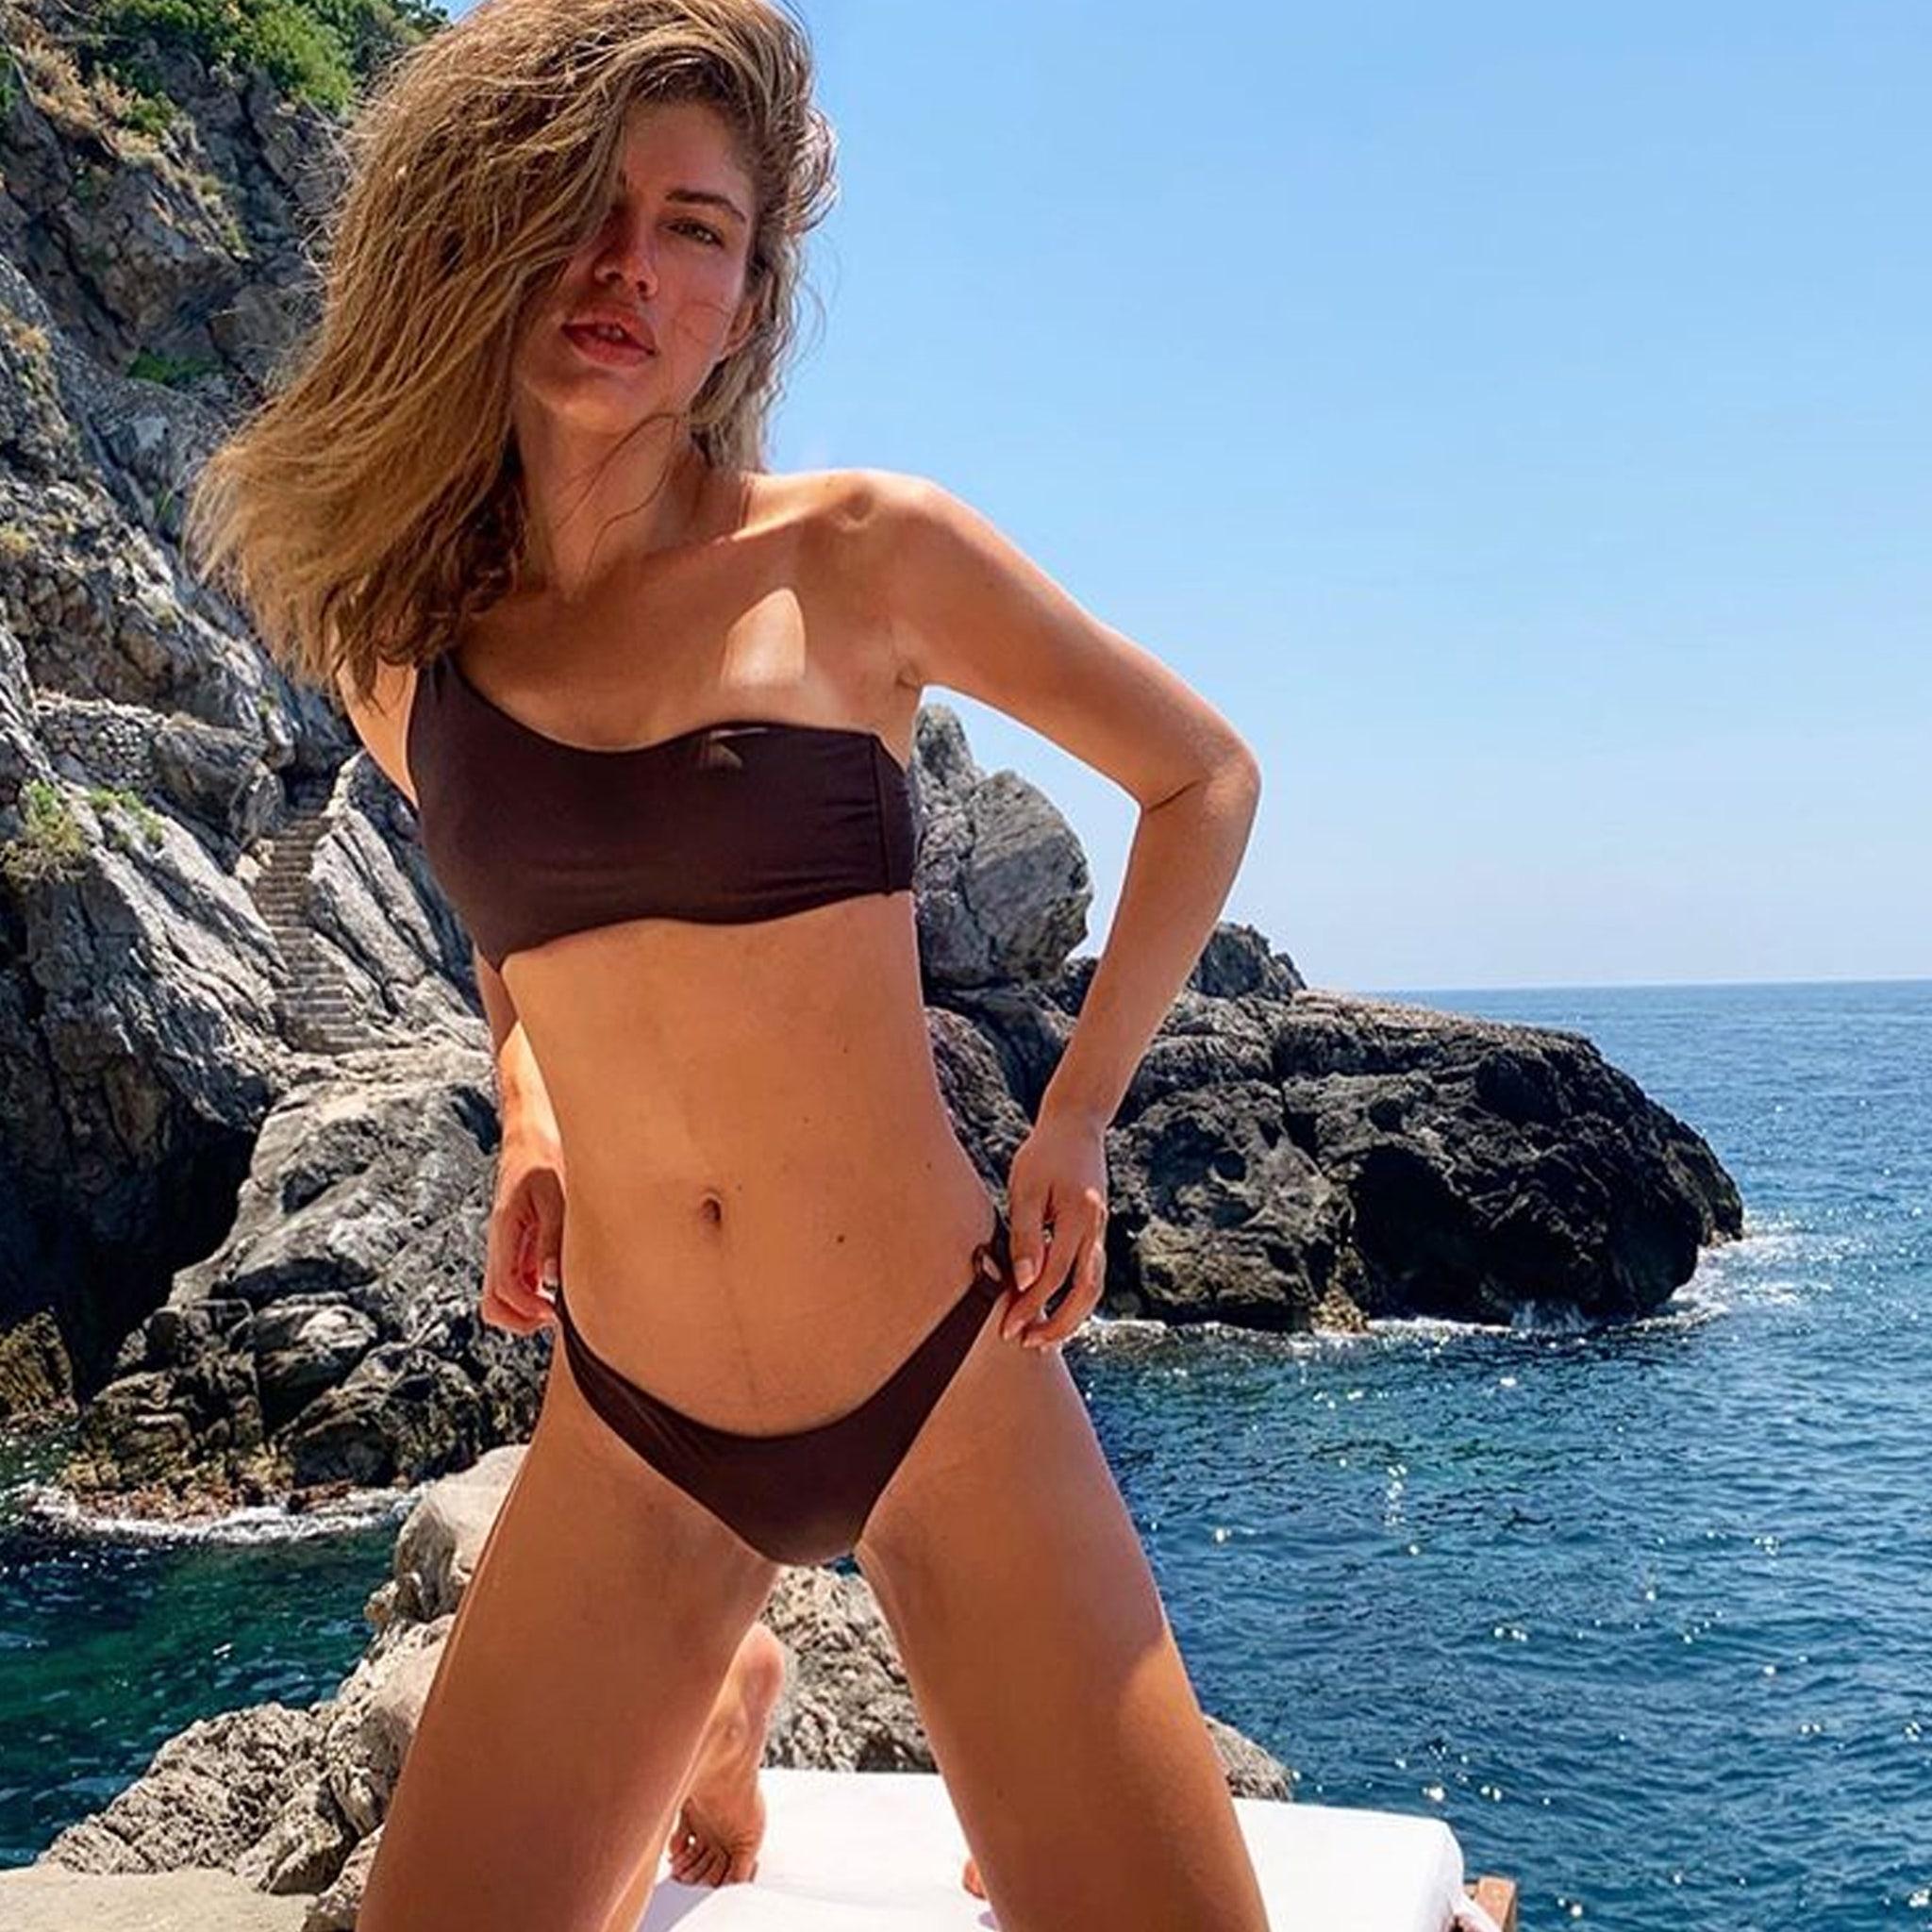 alissa milano lesbian